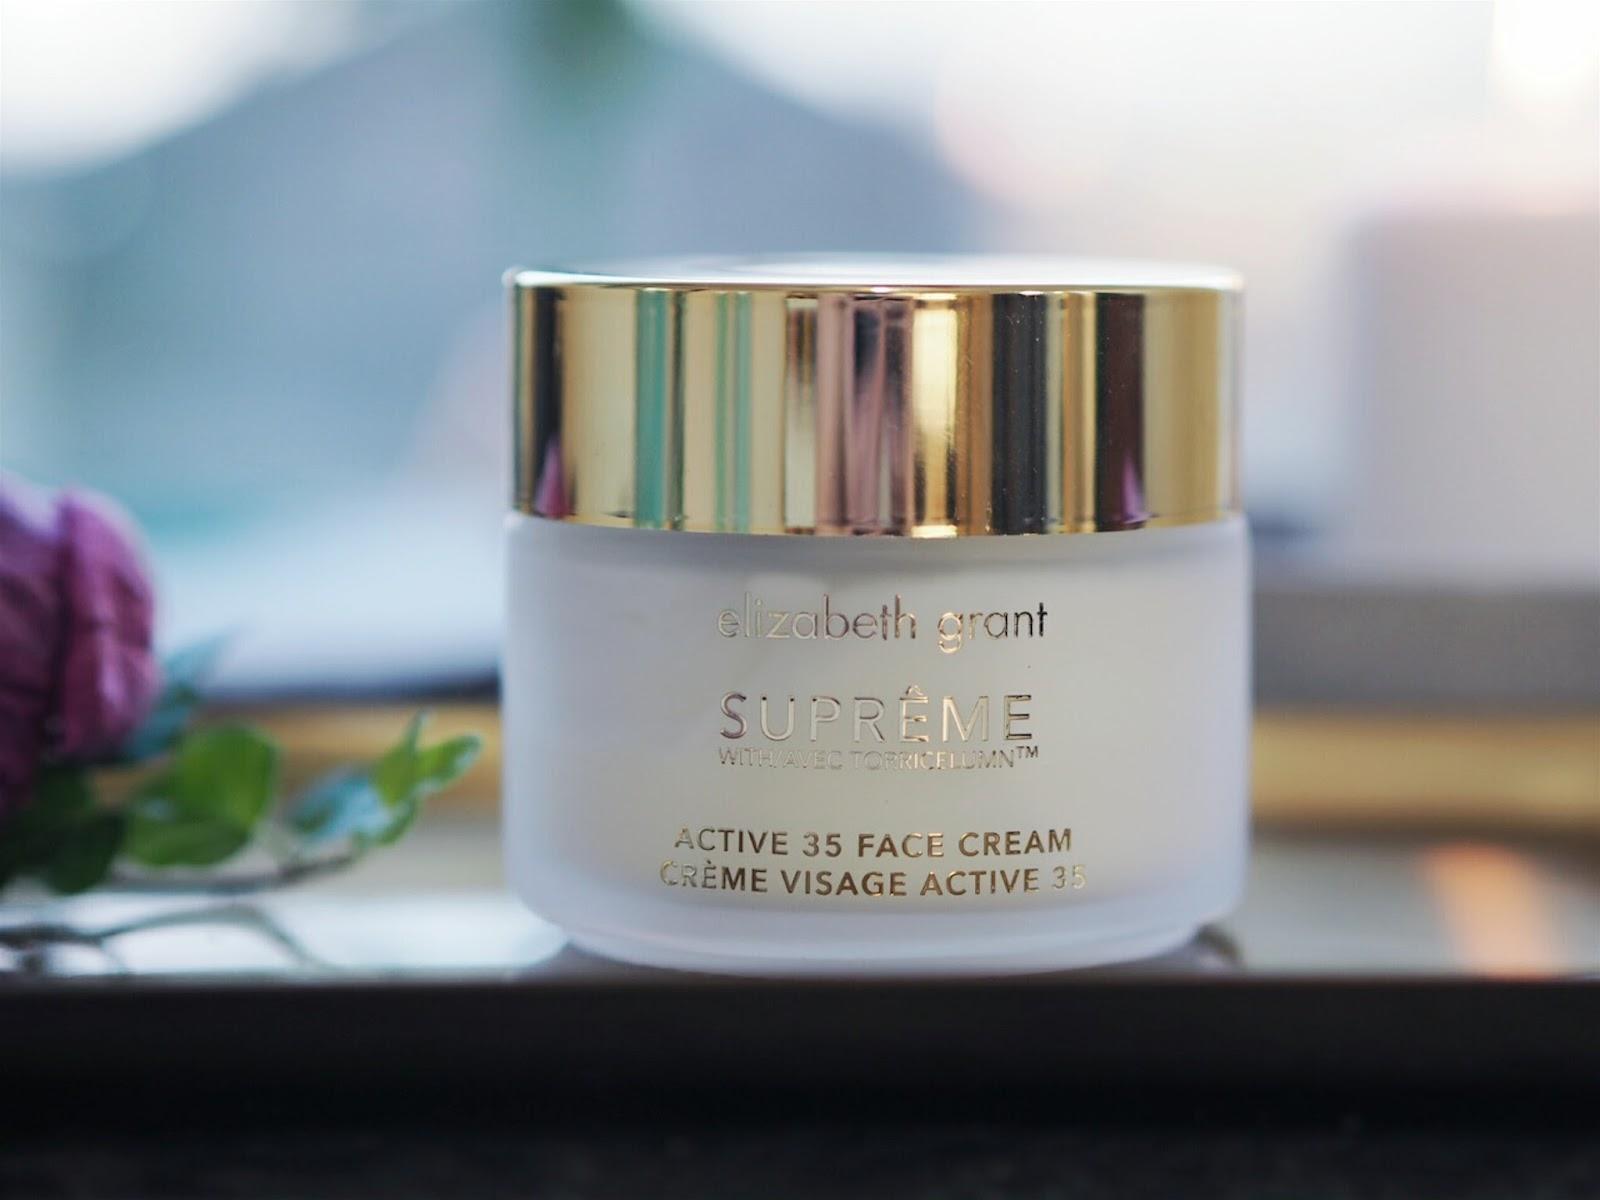 Elizabeth Grant supreme active 35 face cream review